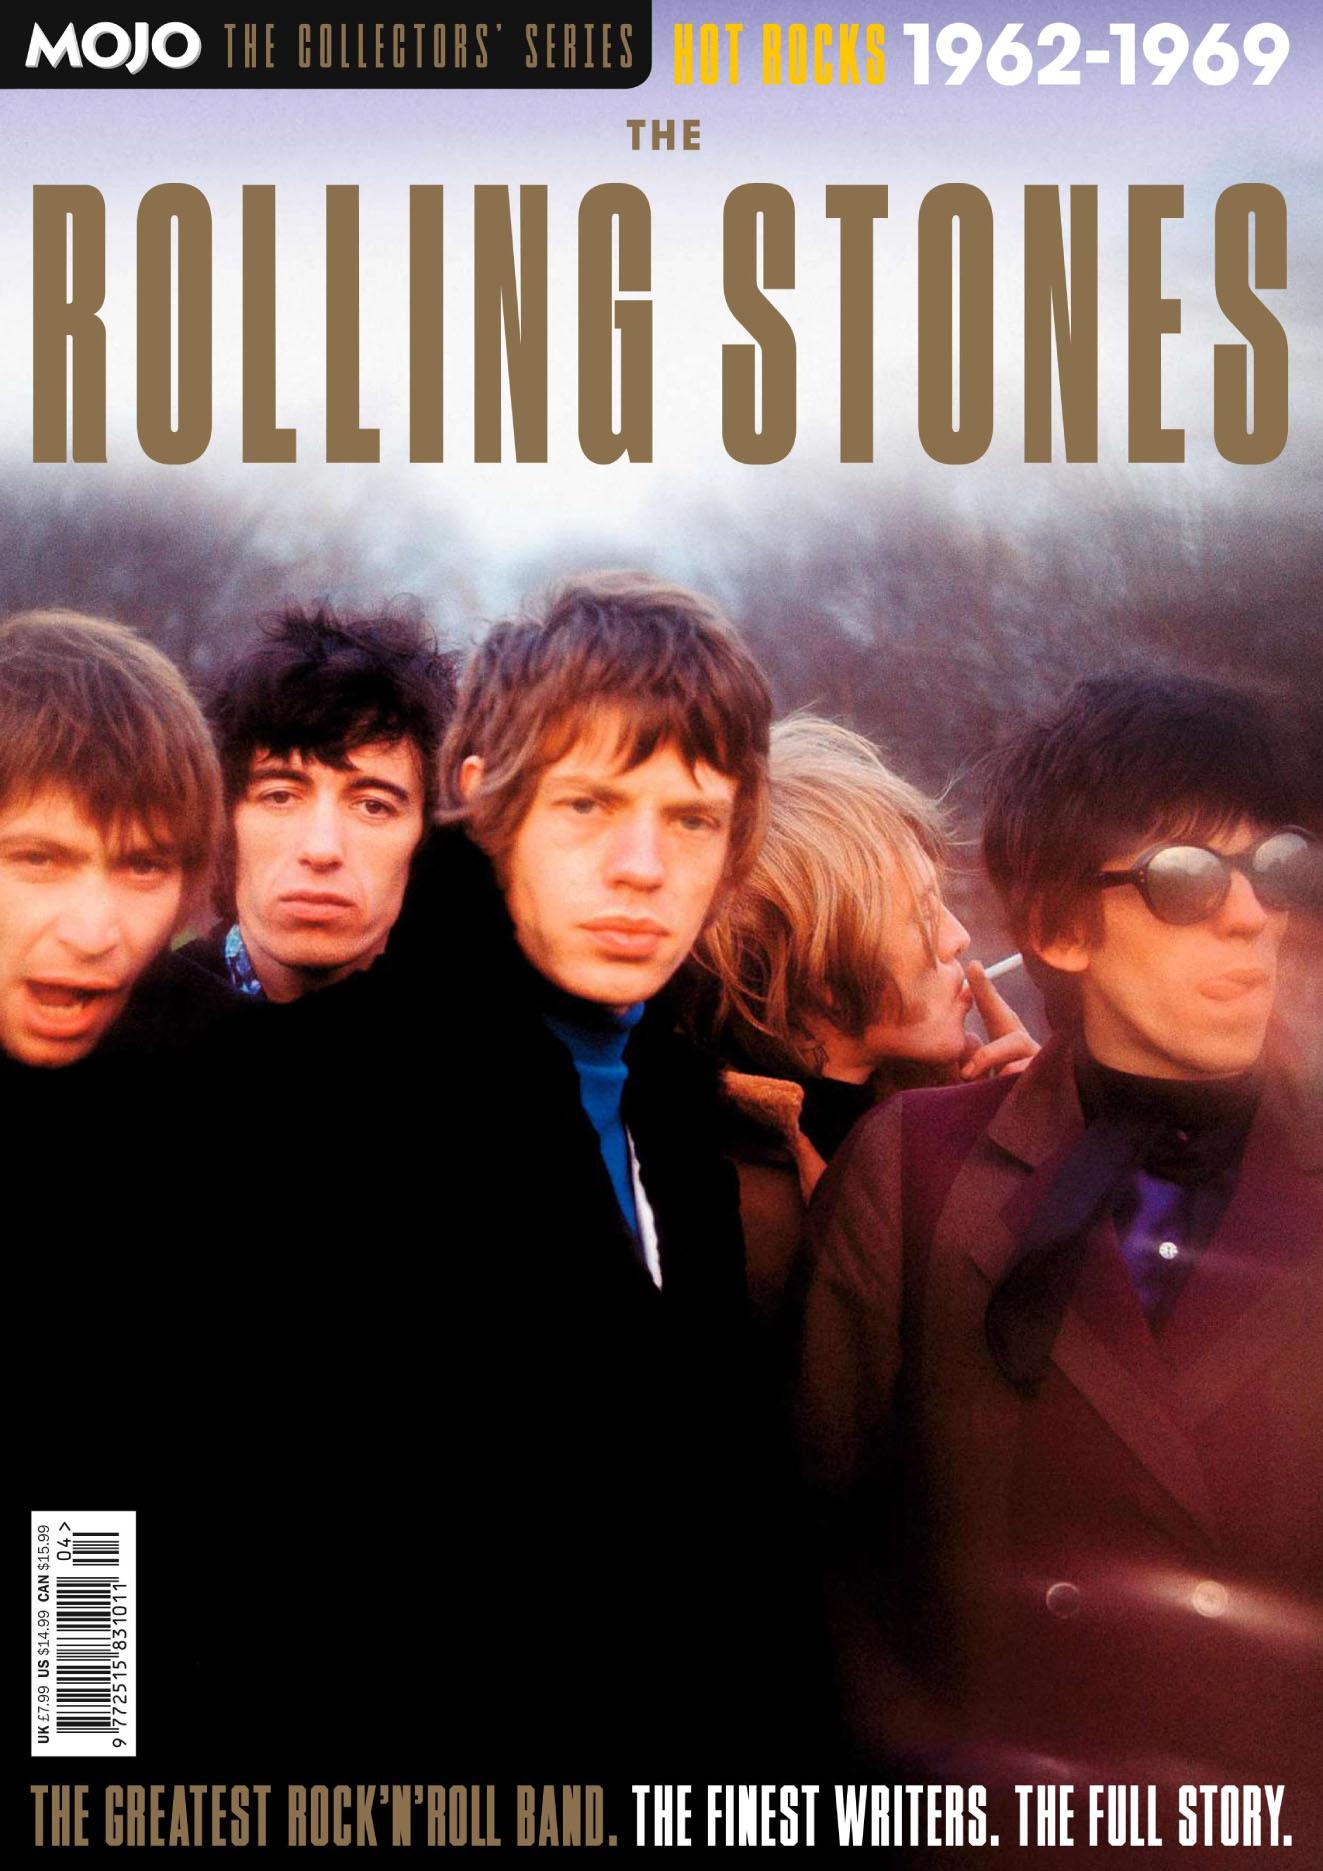 MOJO Sp Rolling Stones Part 1 2019.jpg